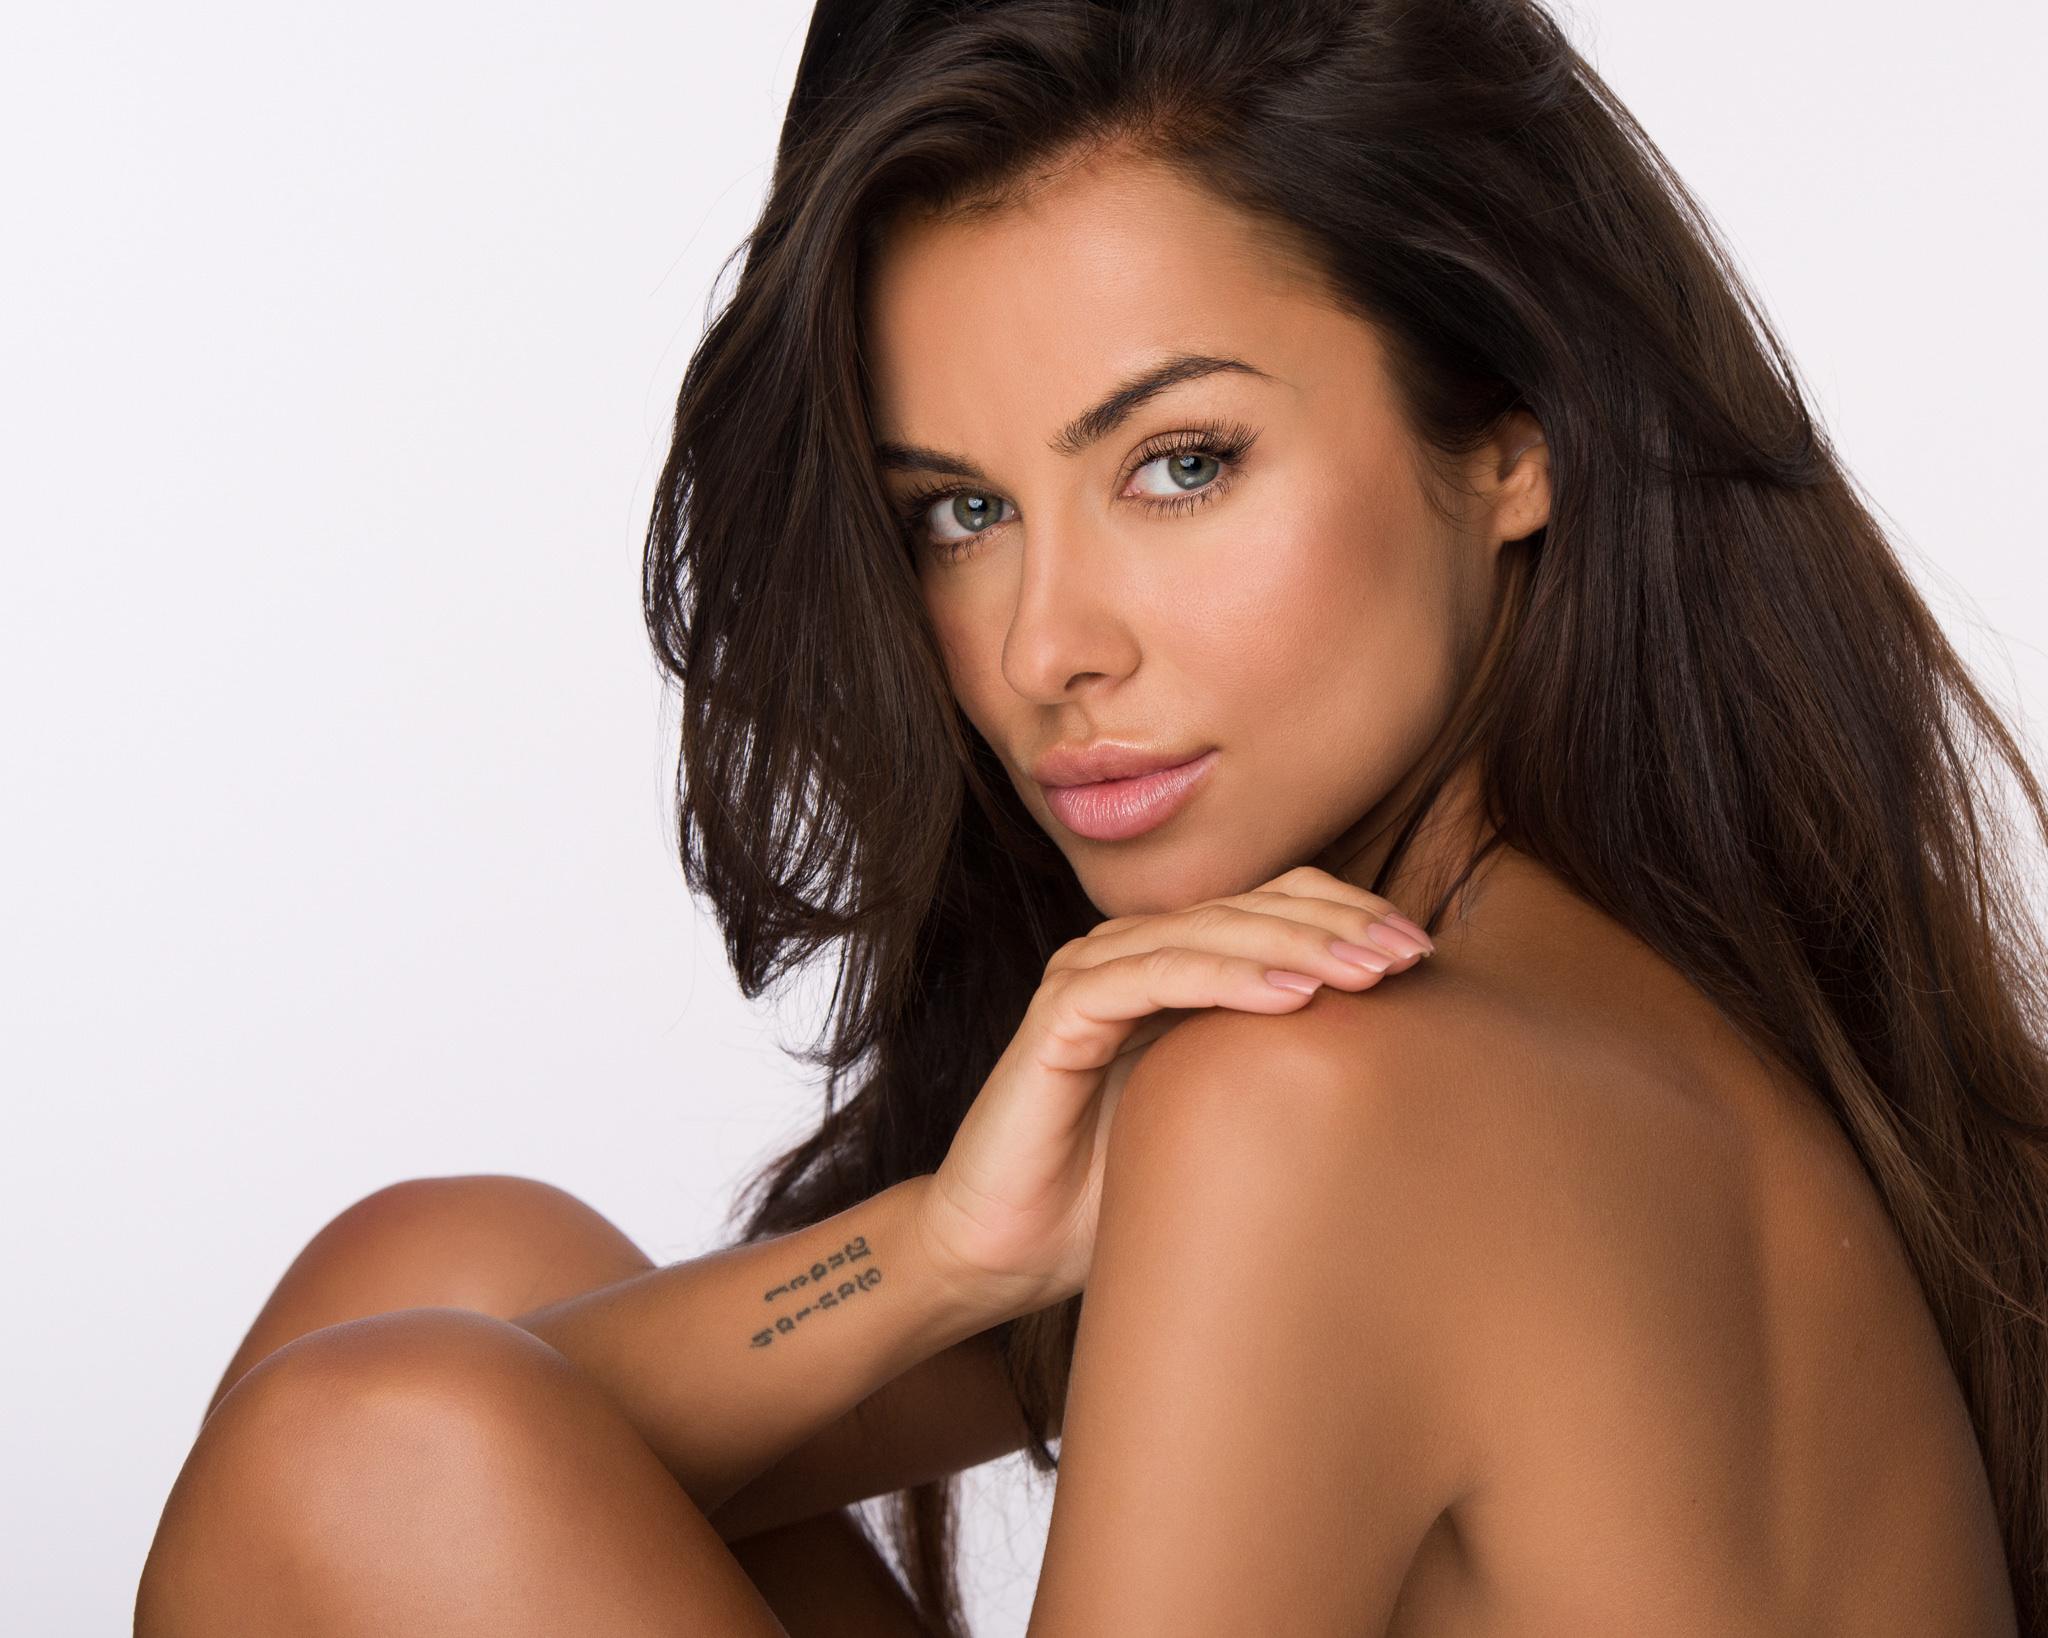 Natalia Siwiec Hairstyle